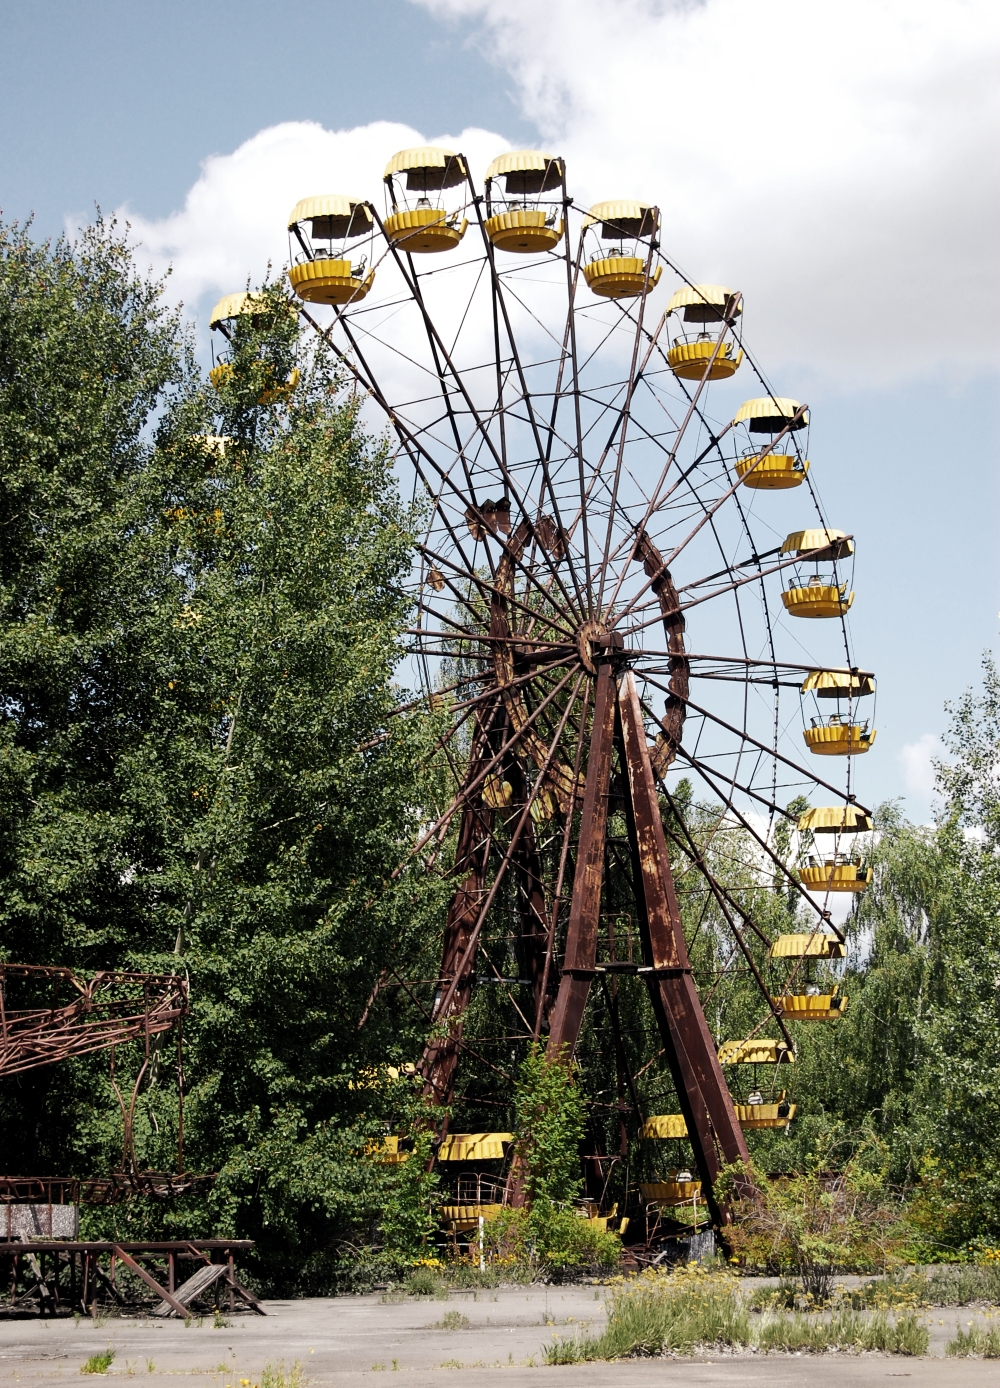 Chernobyl Fairground Wheel